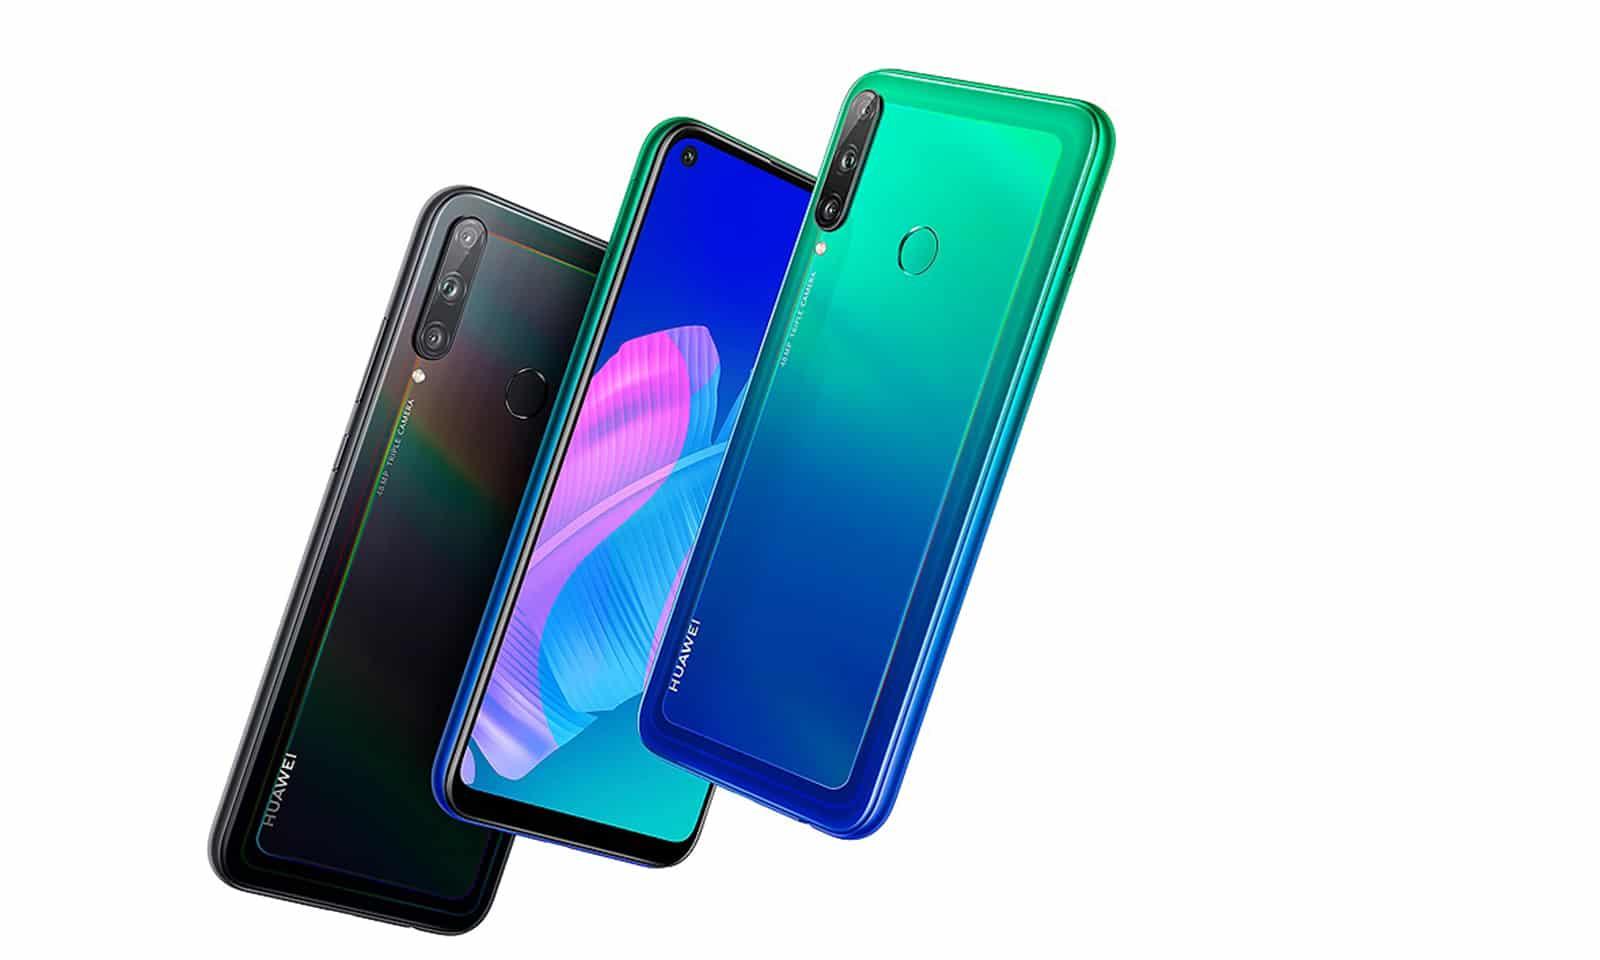 Le Huawei Y7p